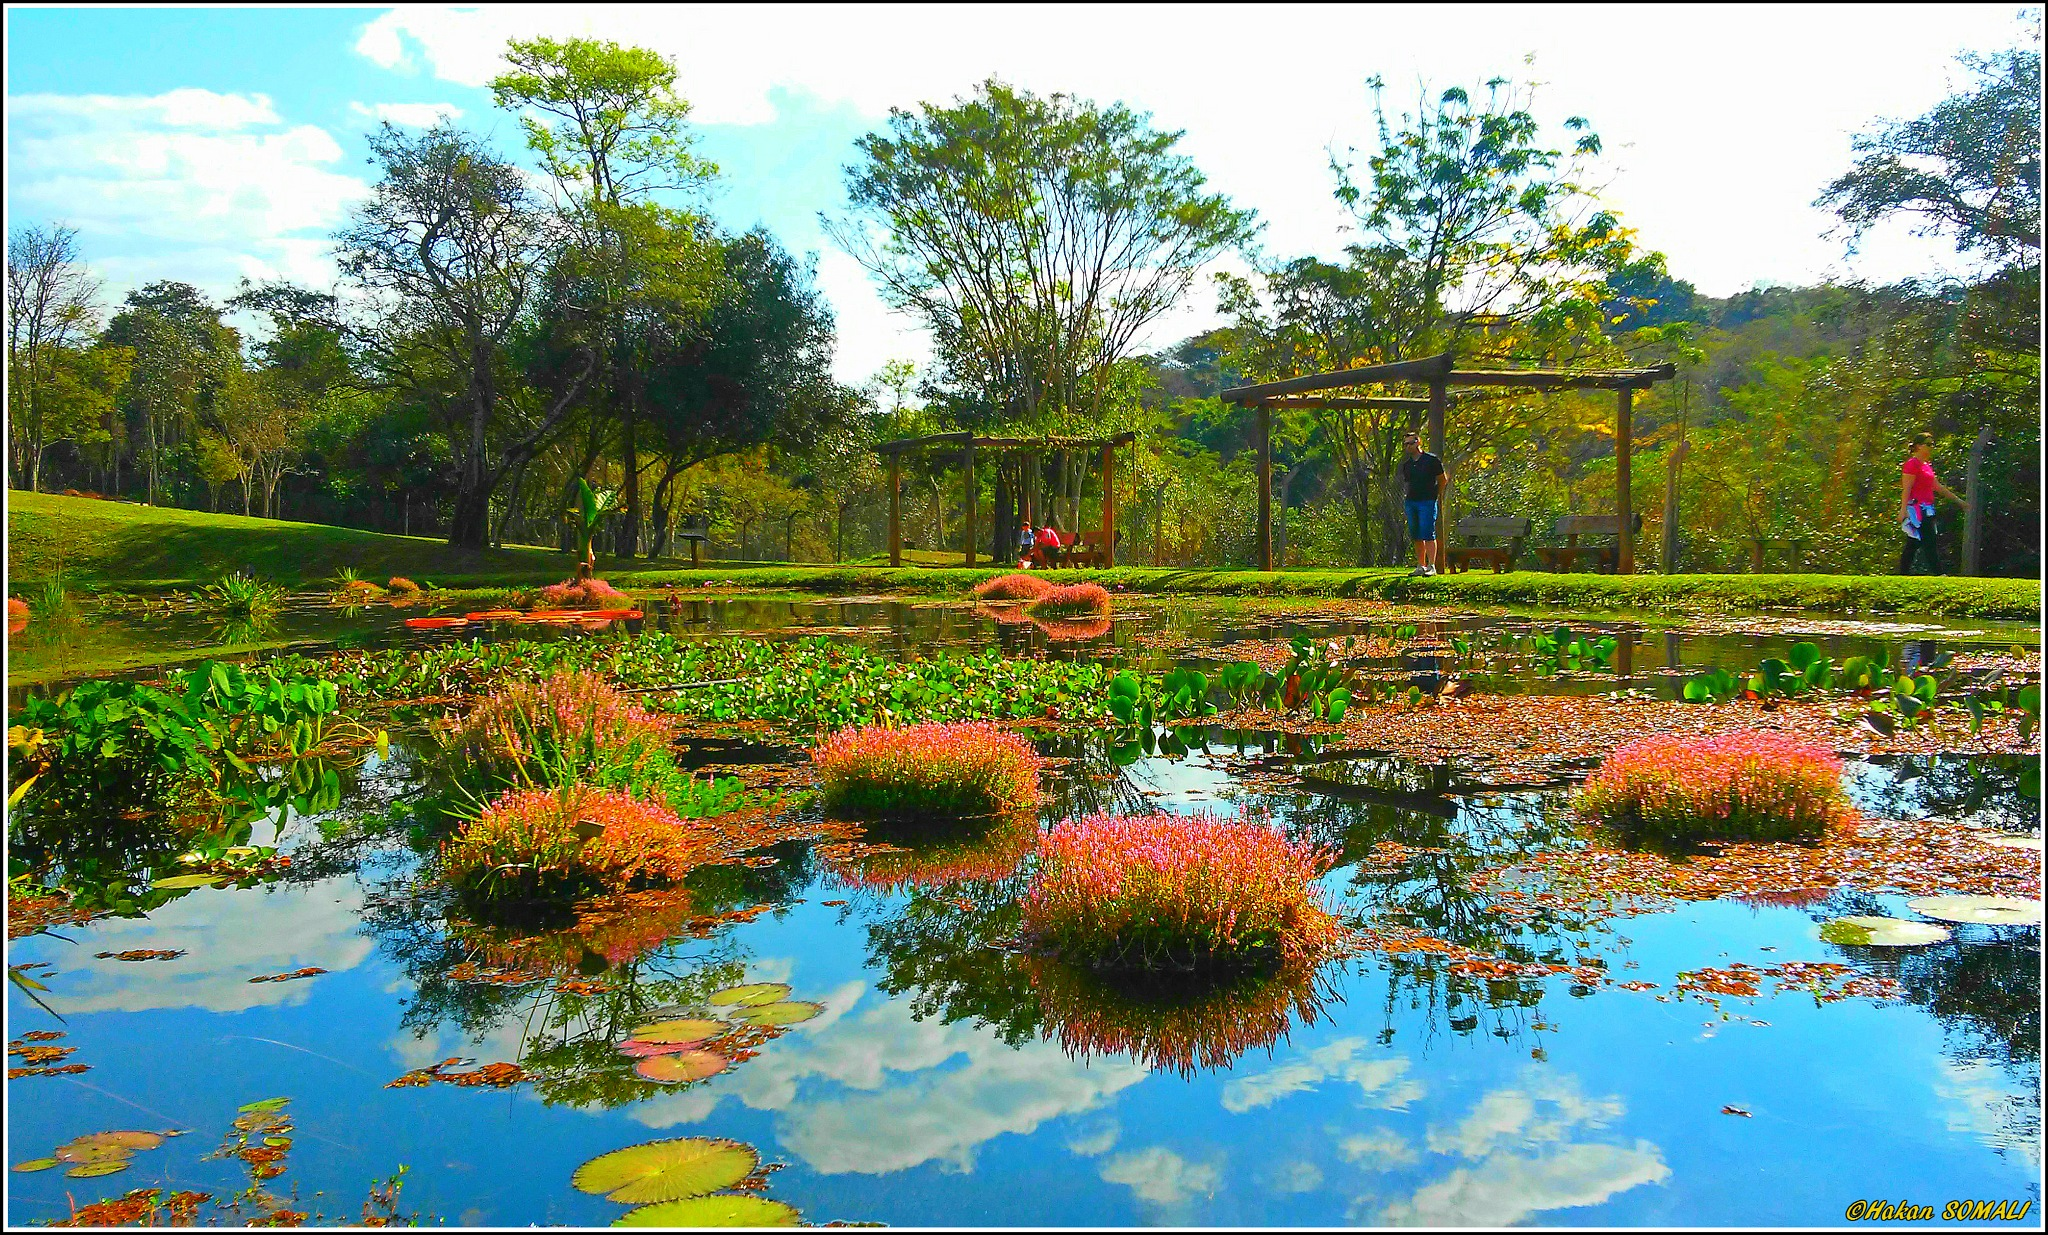 Paisagem I - Jardim Botânico Municipal de Bauru / São Paulo by Hakan Somali